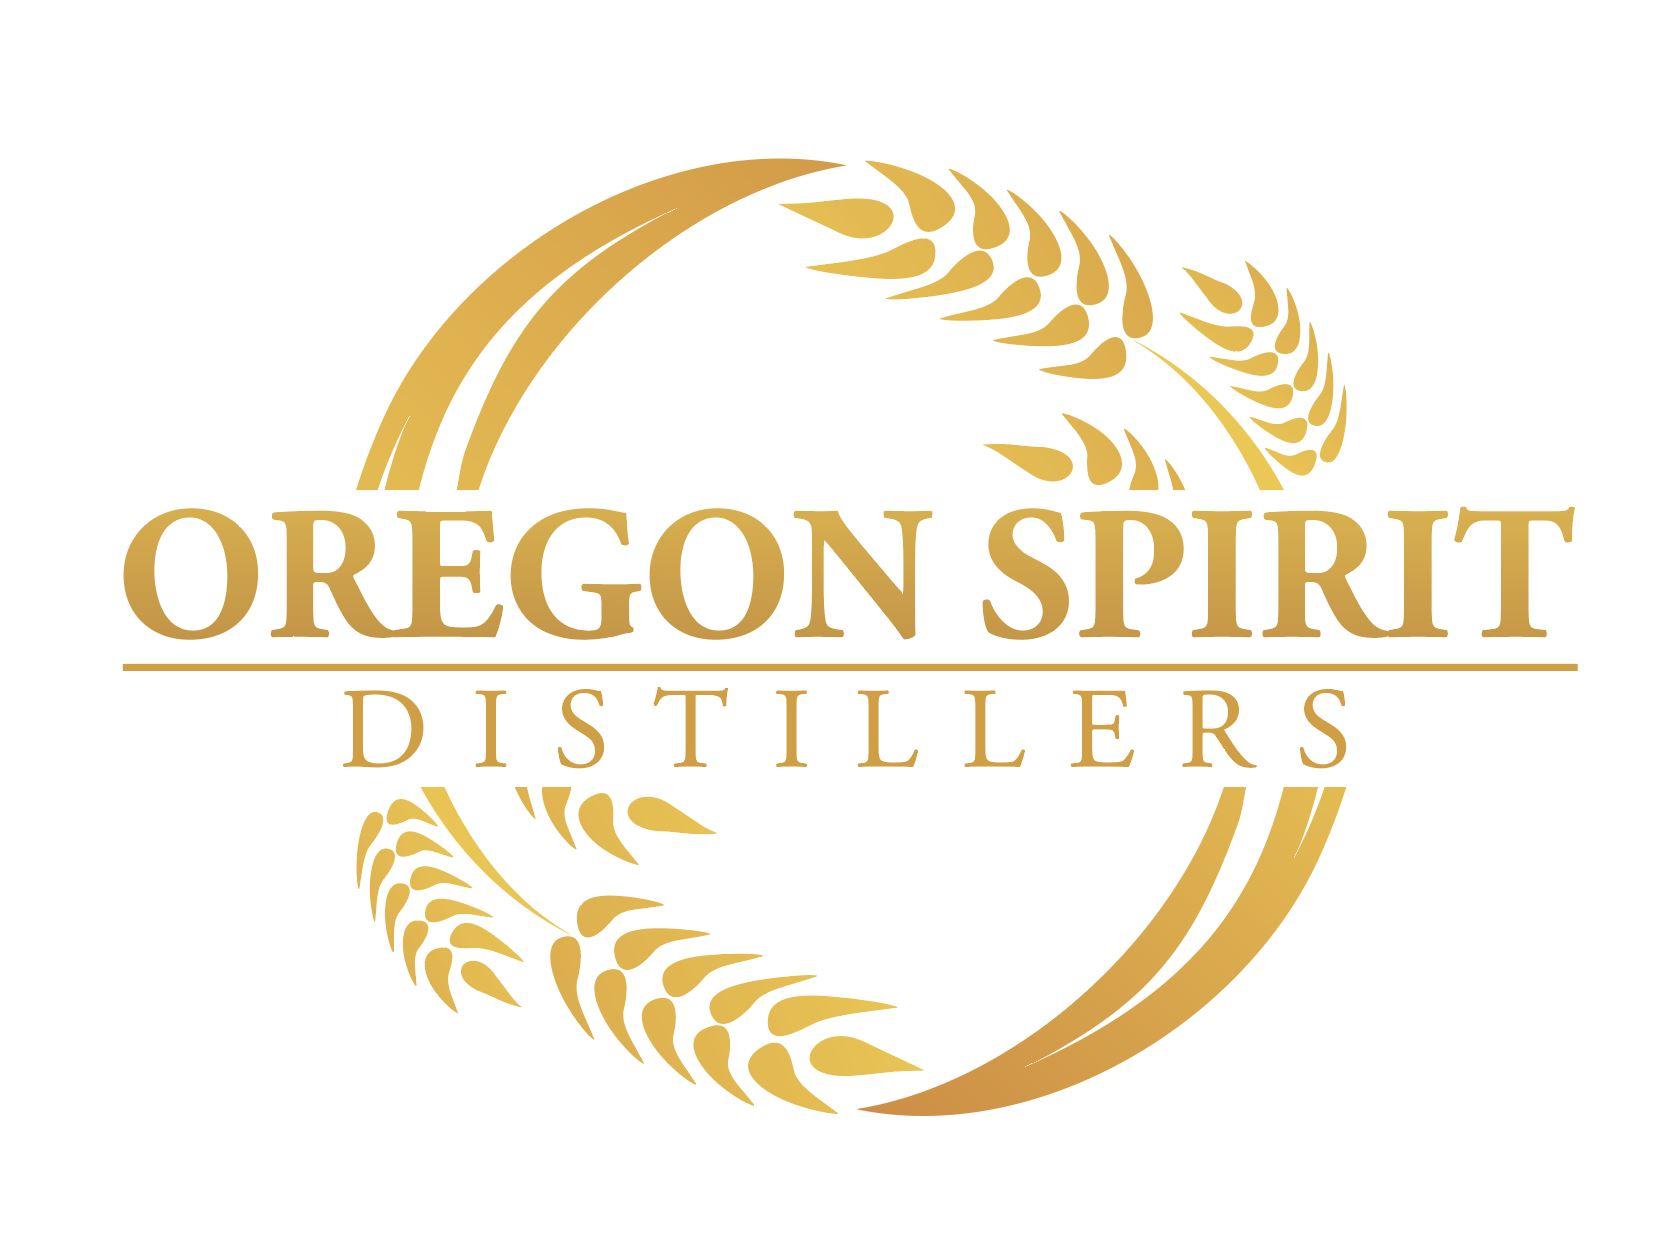 Oregon Spirit distillers2.JPG